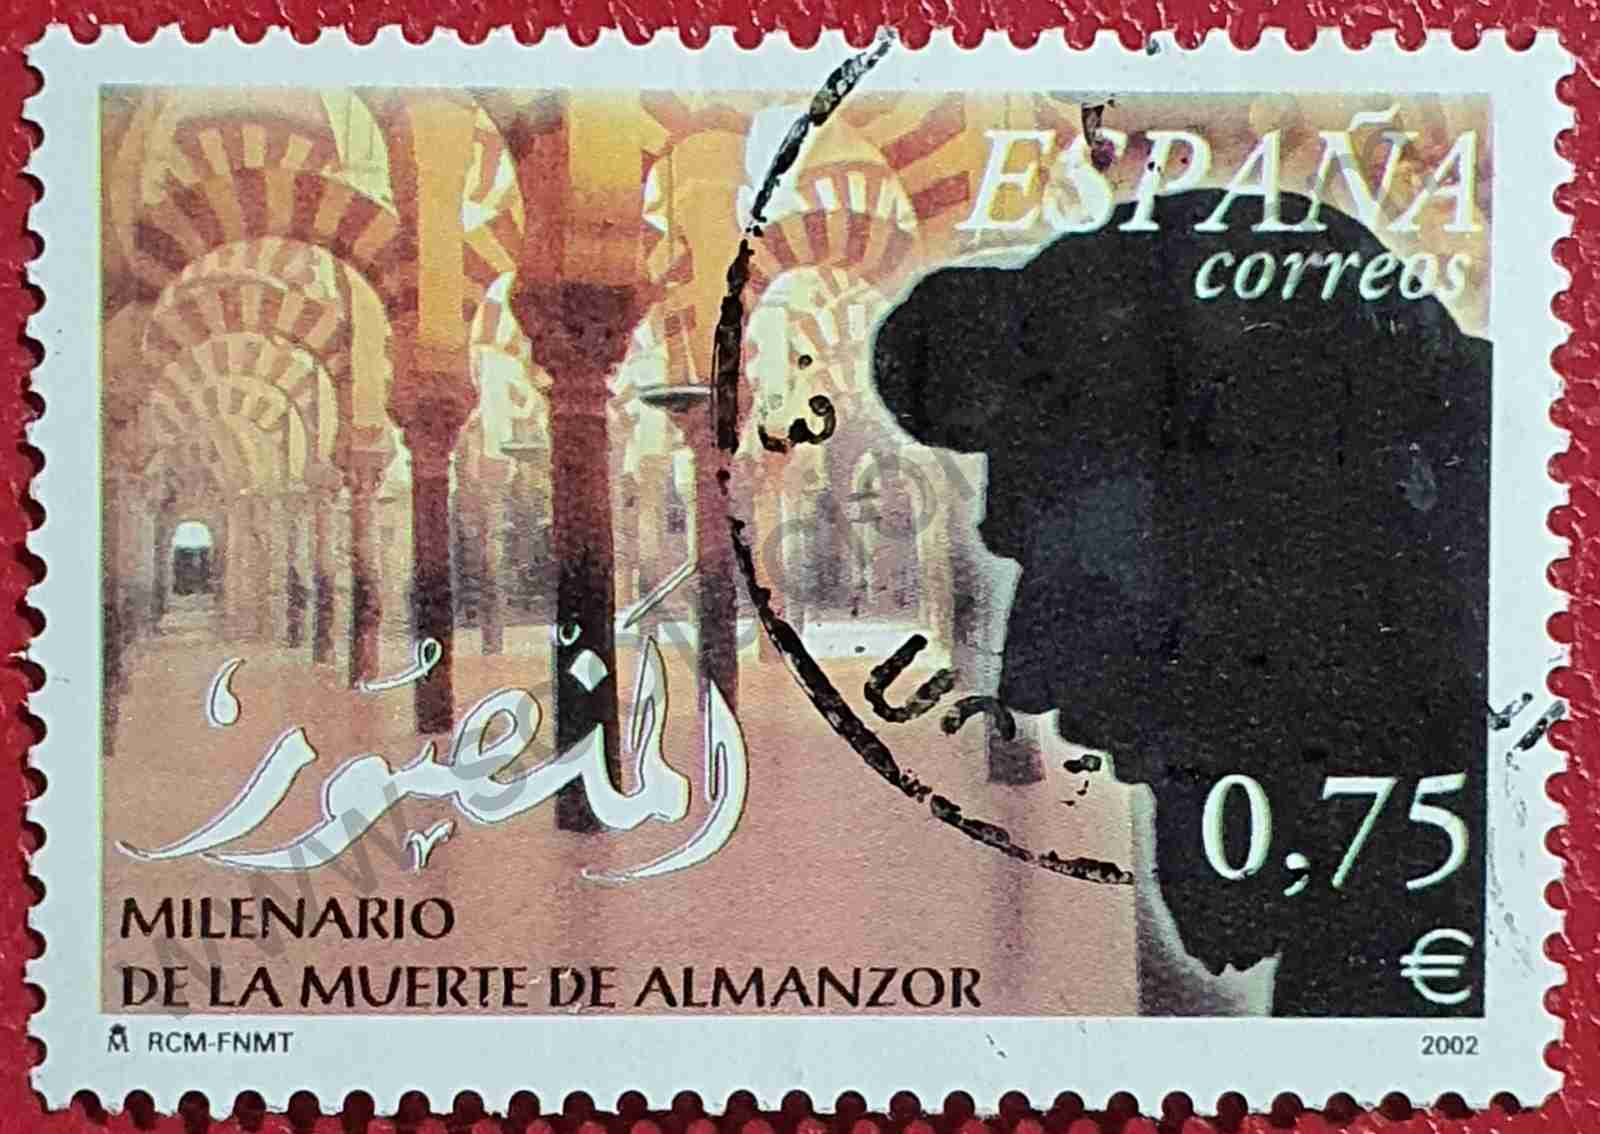 Mezquita Córdoba y Almanzor - Sello España 2002